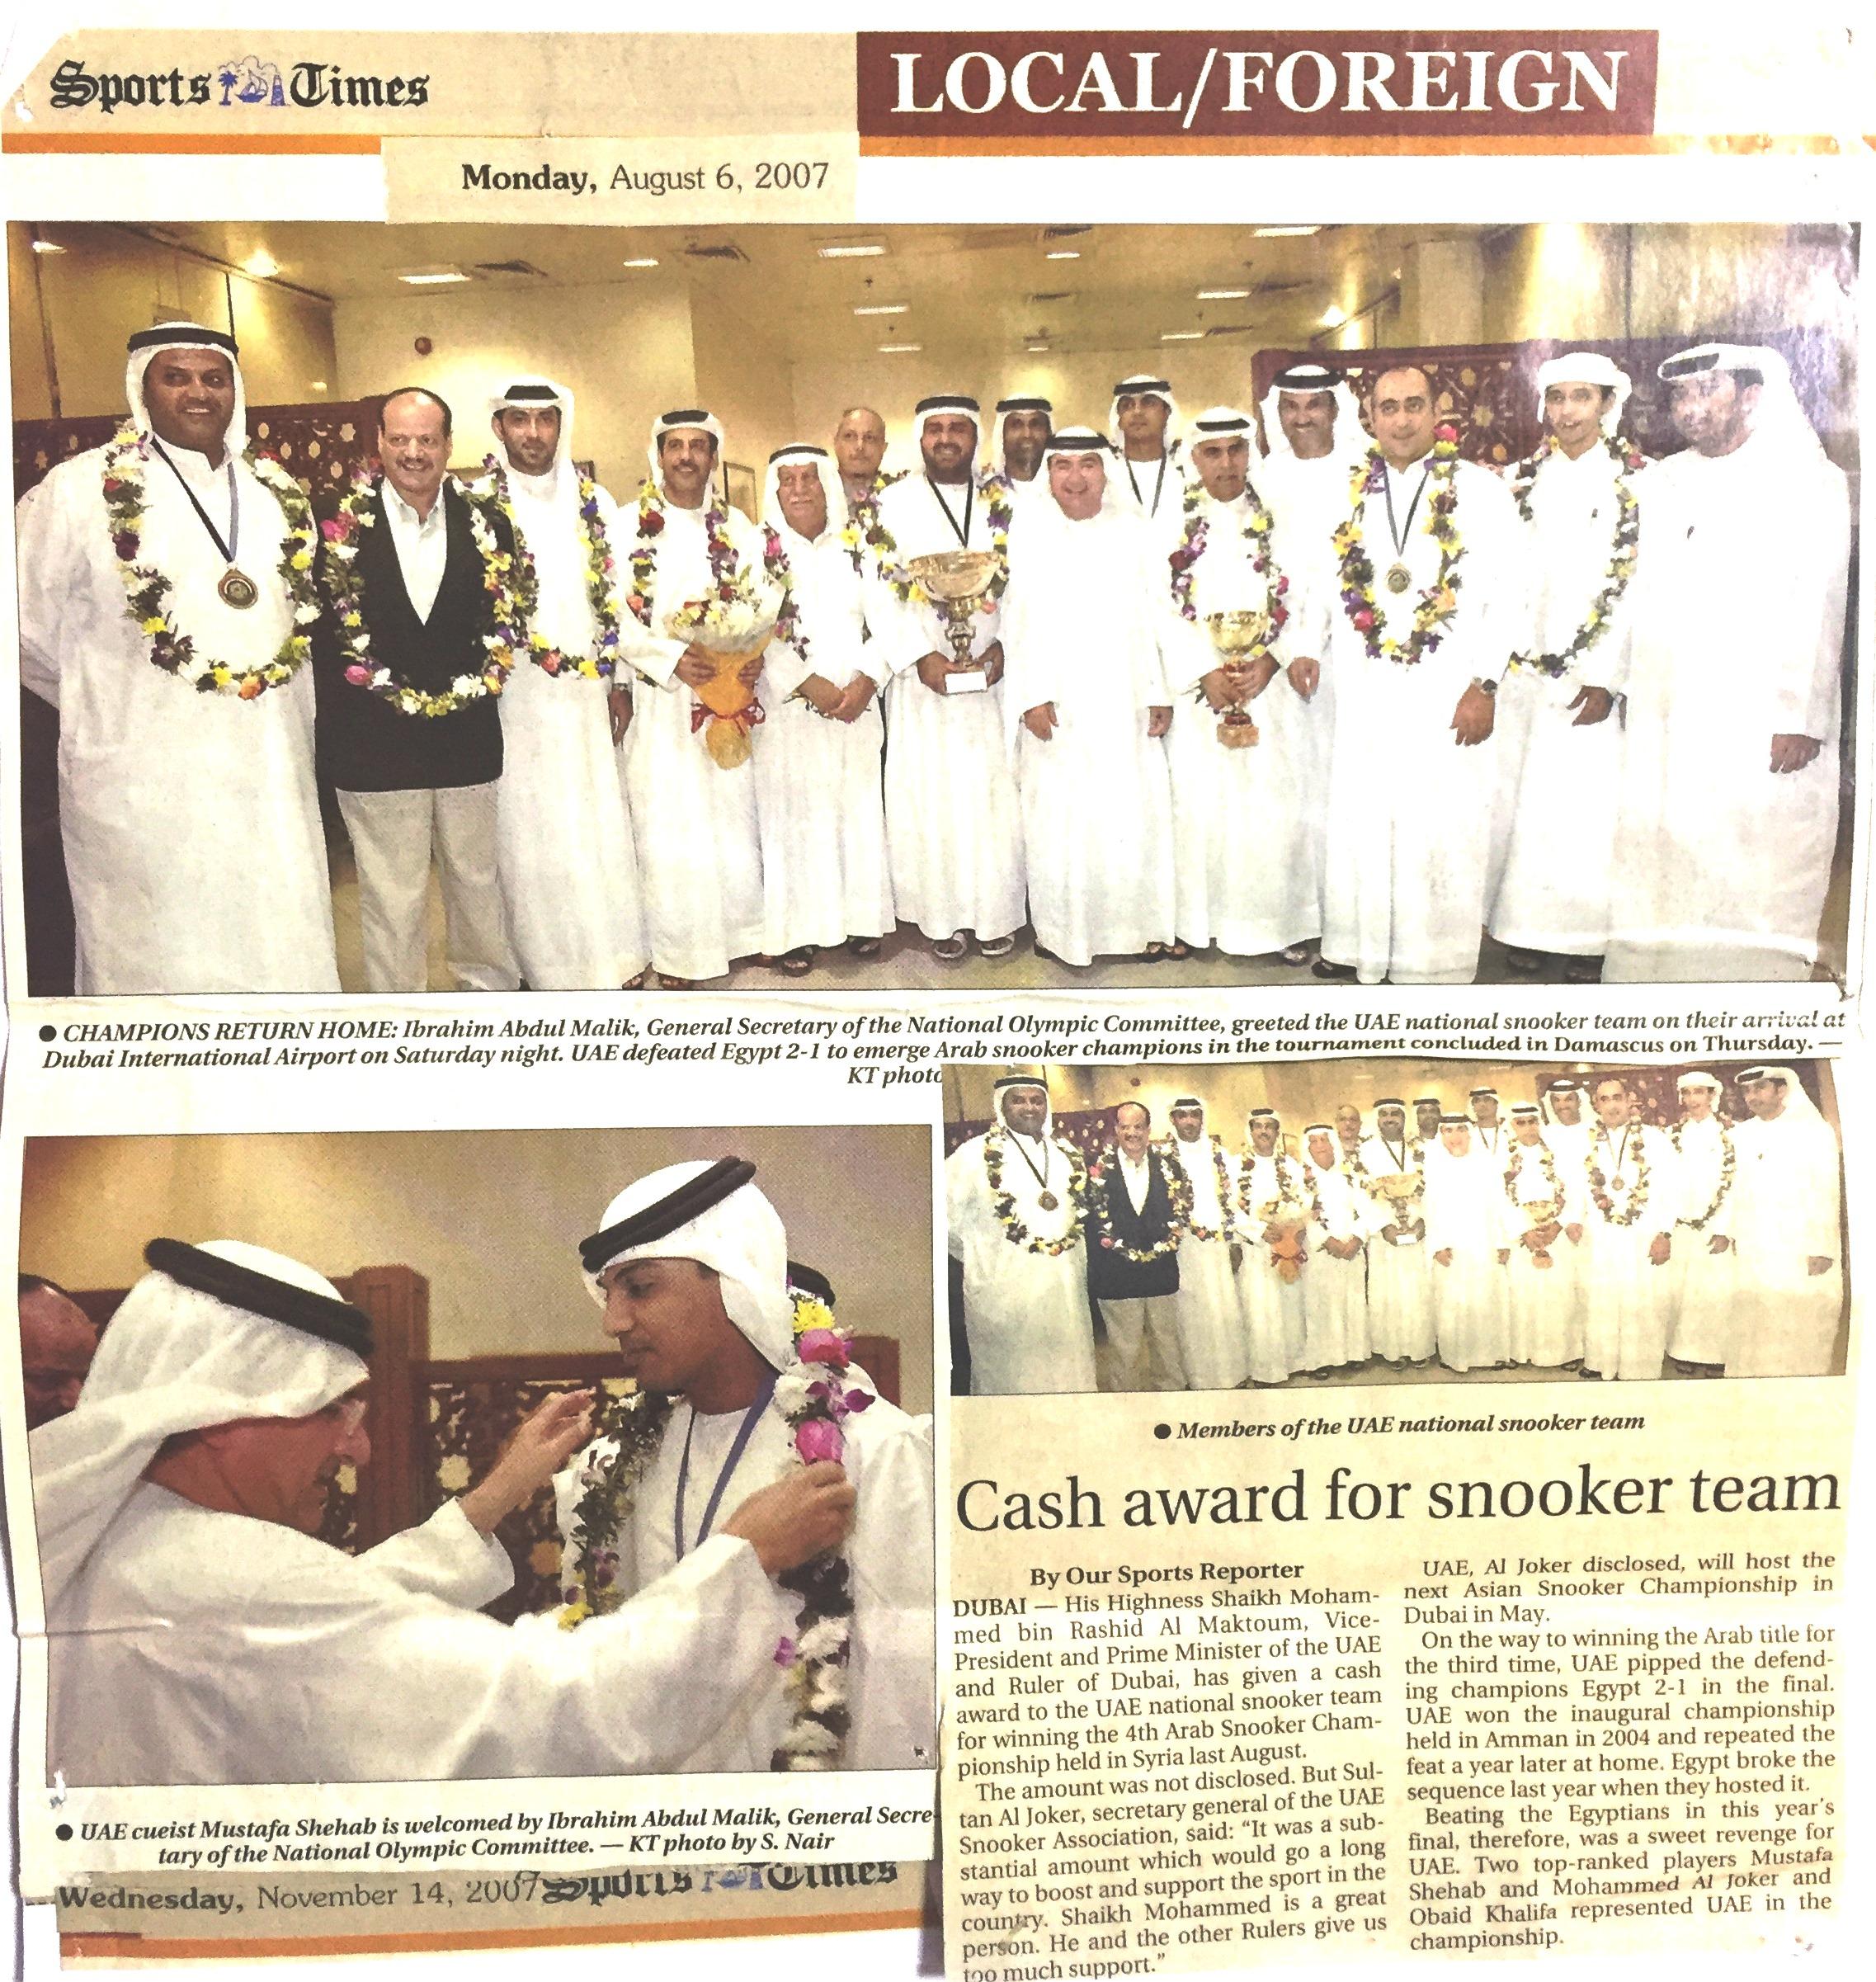 Cash award for snooker team